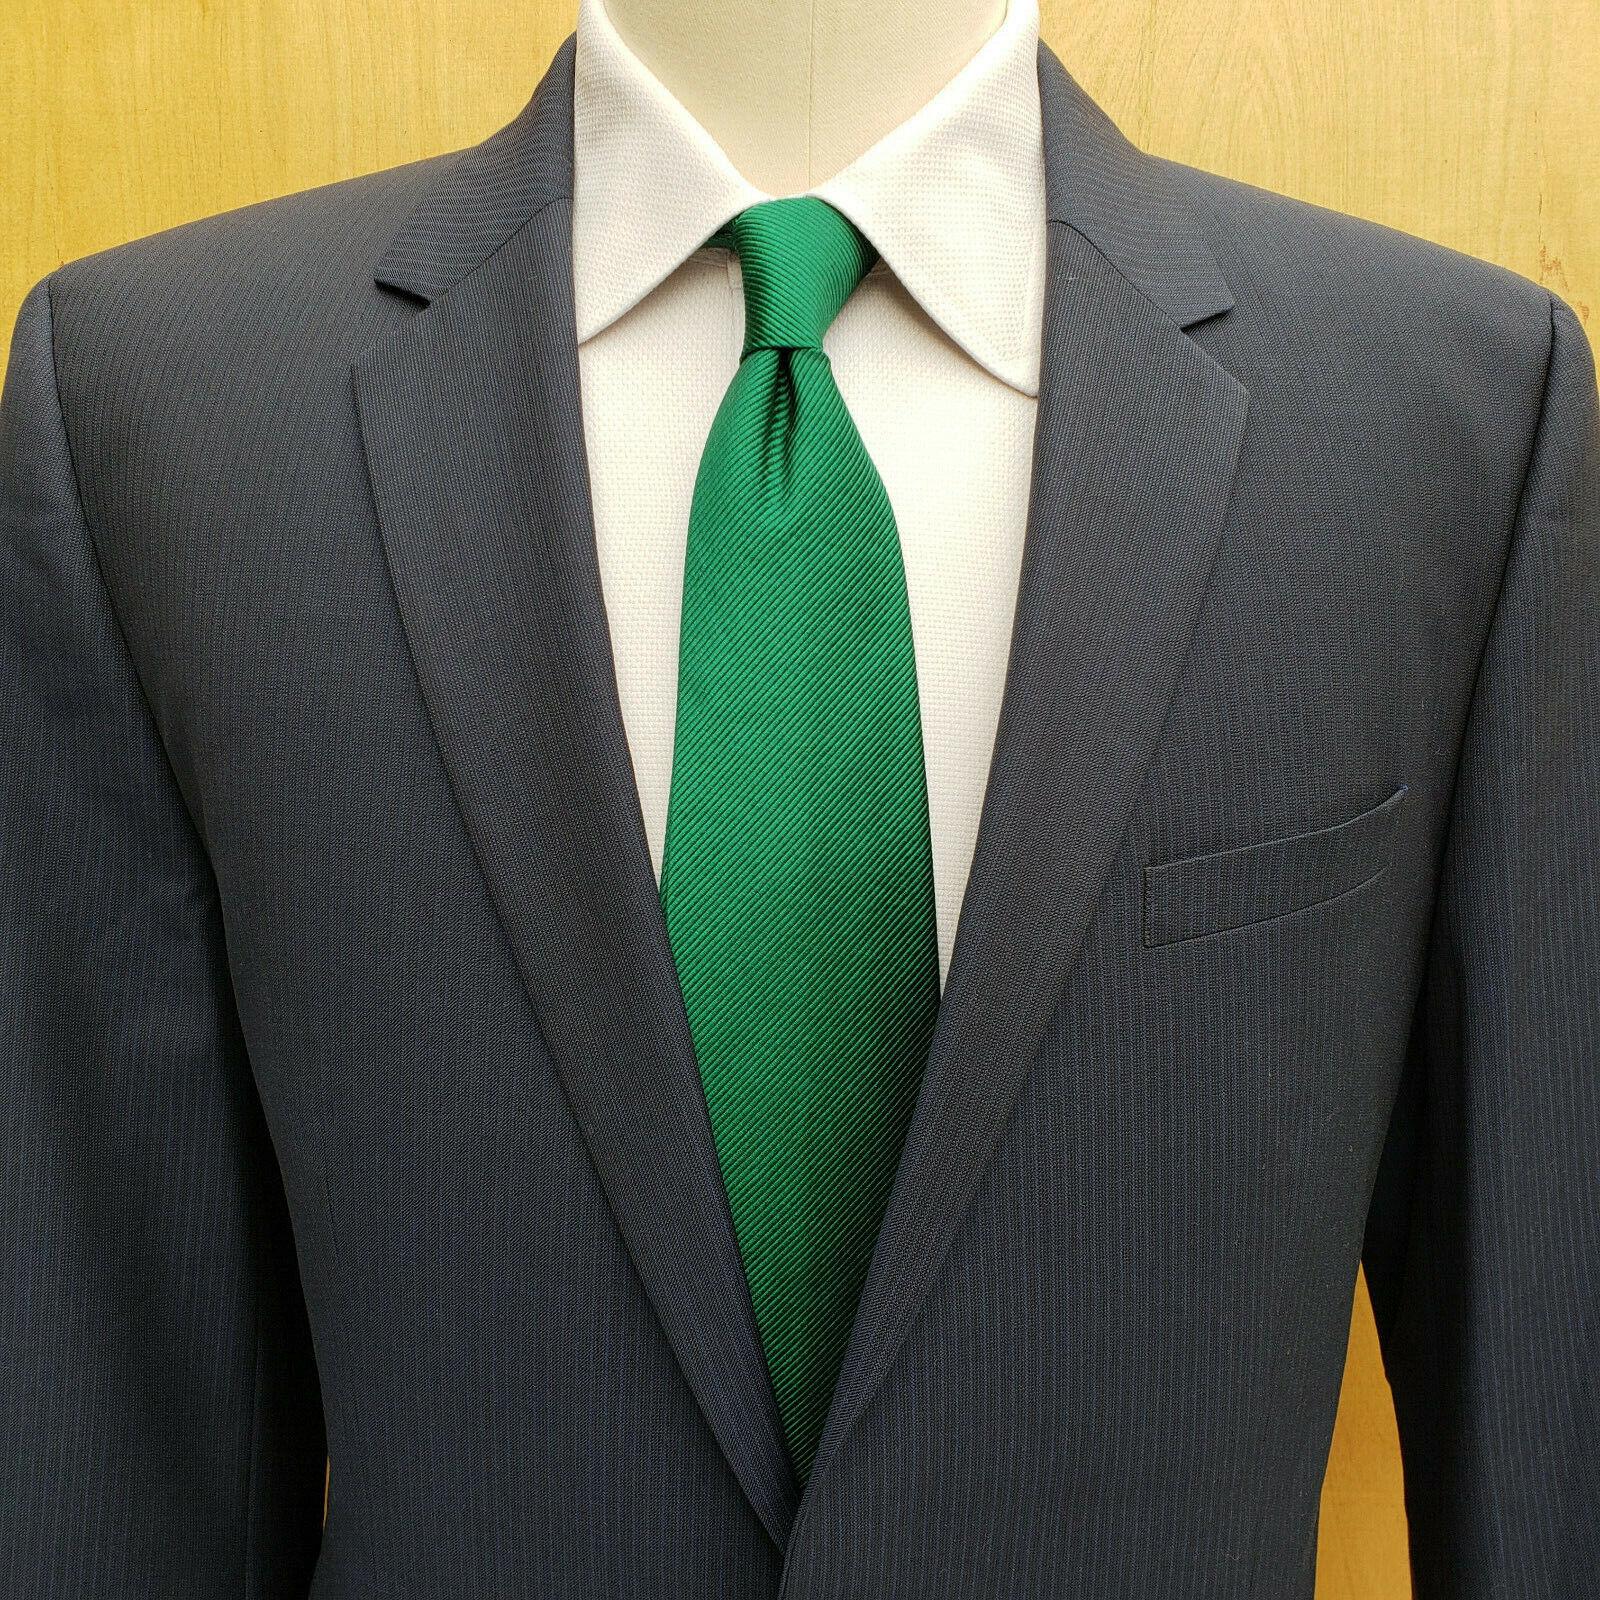 Current Hugo Boss Aeron 1 Hamen1 bluee w Woven Stripe Wool 2pc Suit 40 42L EUC